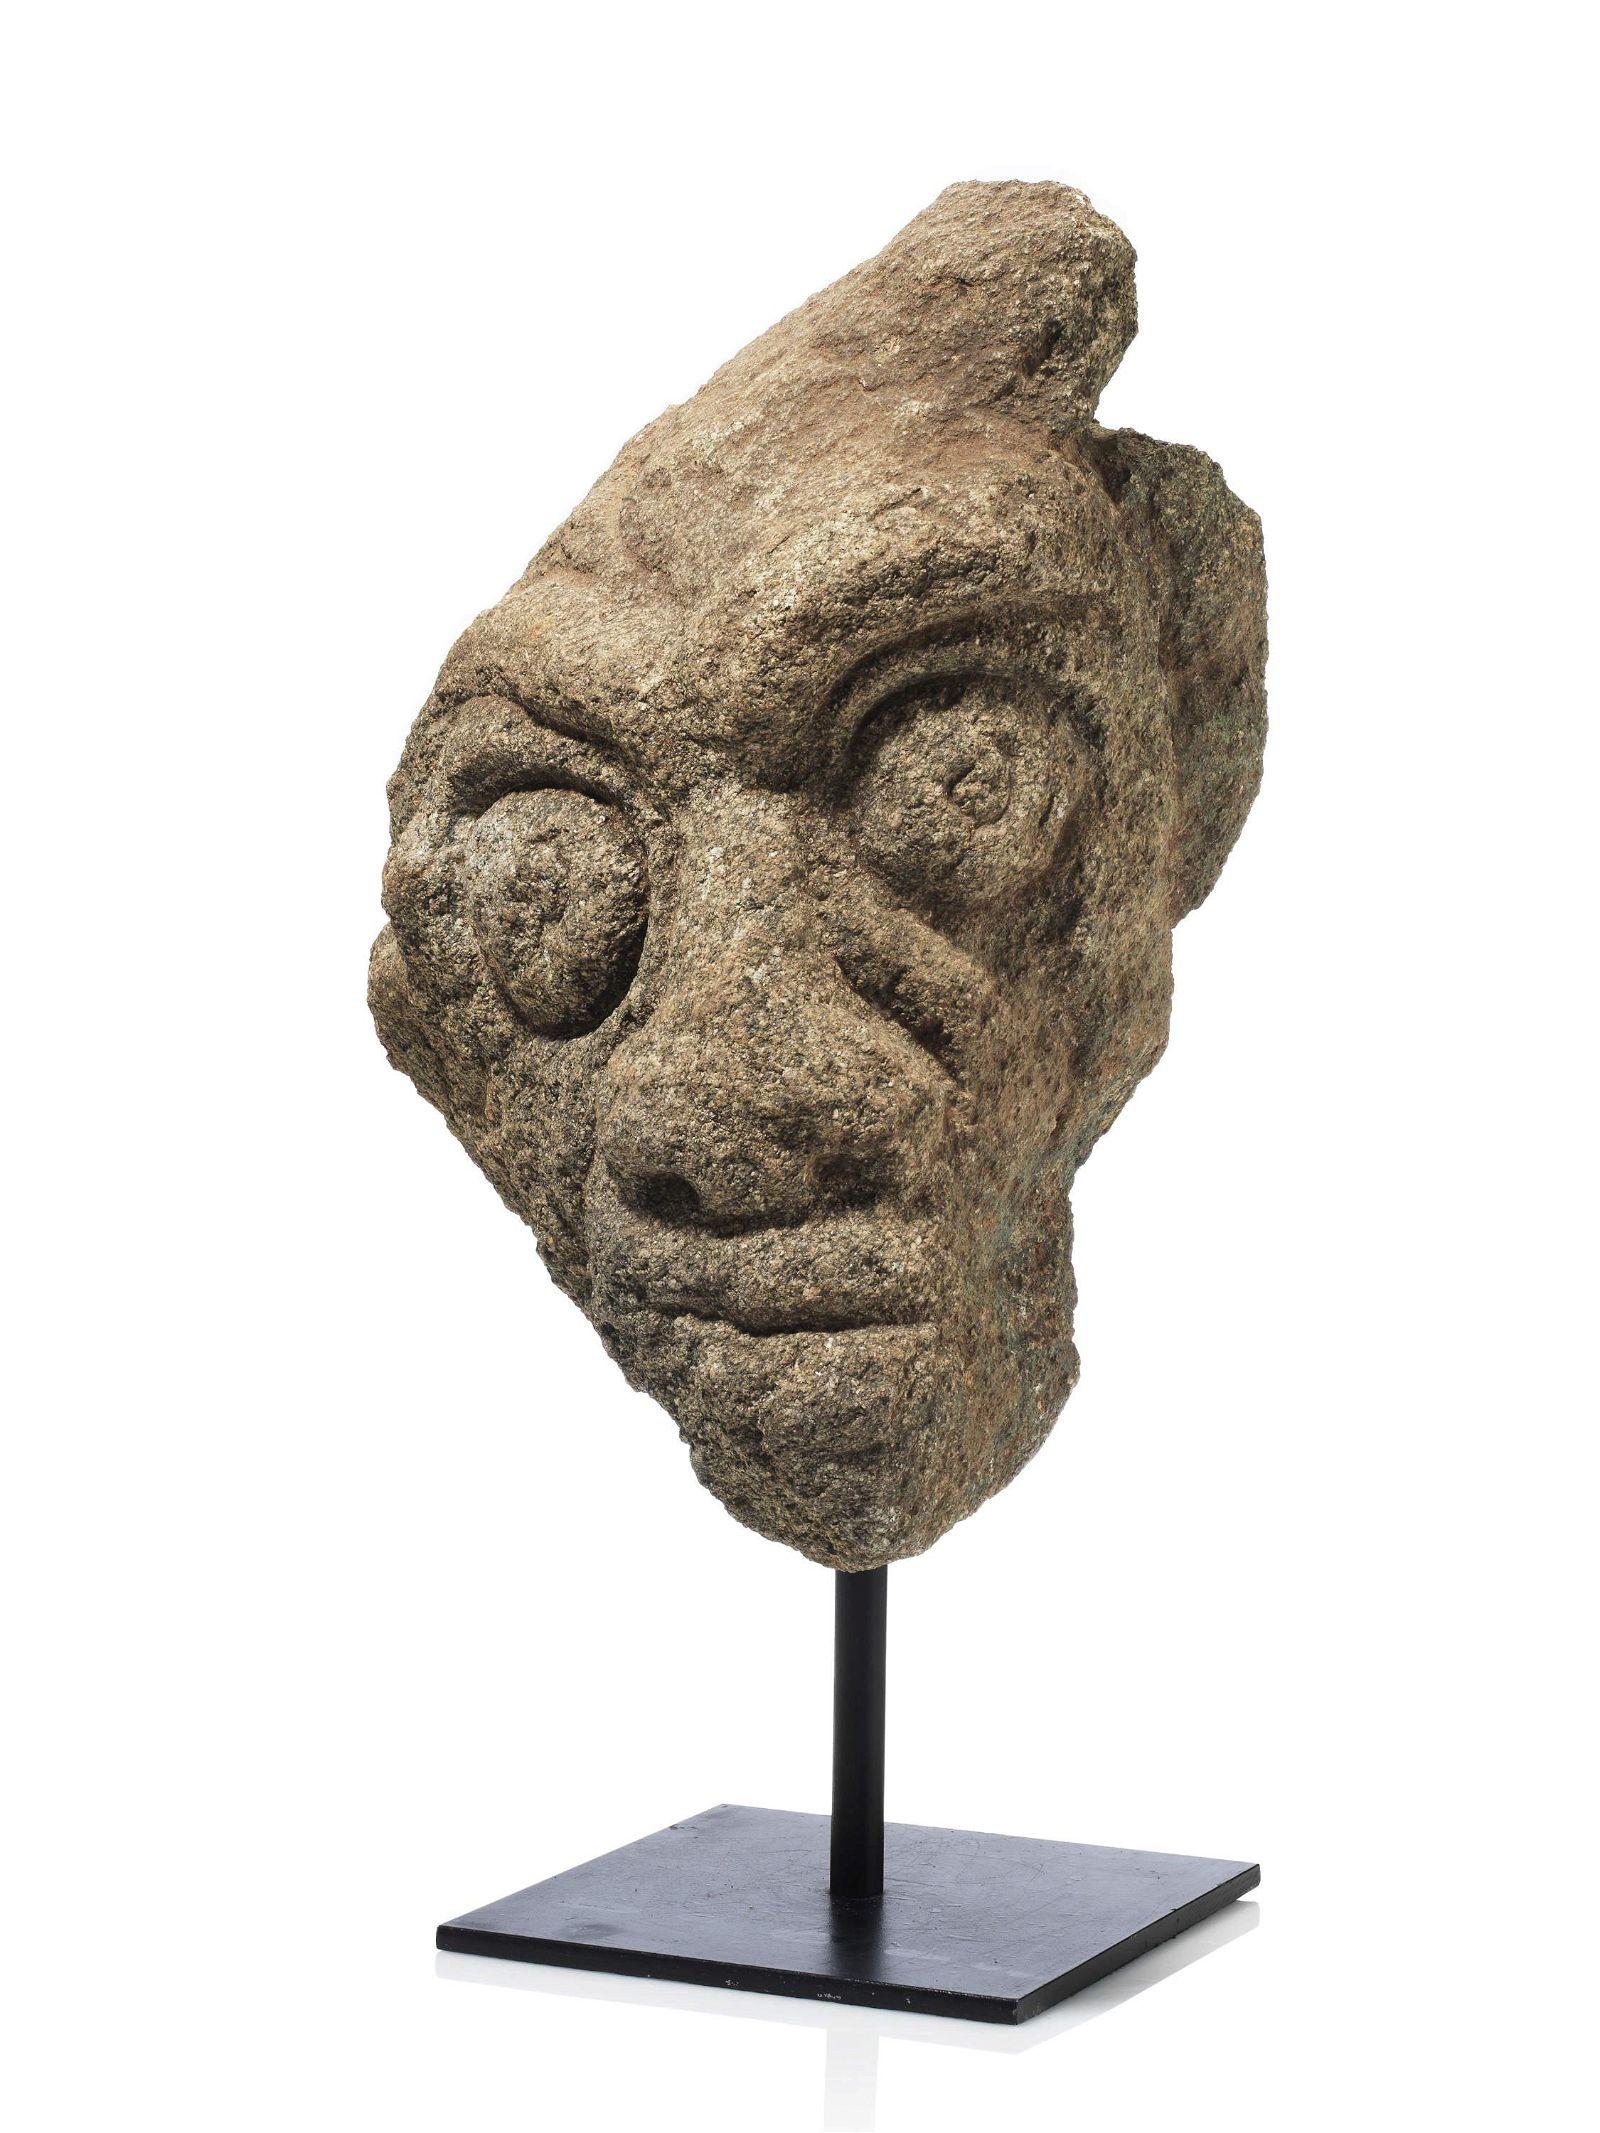 A Pre-Senufo monumental Stone Head